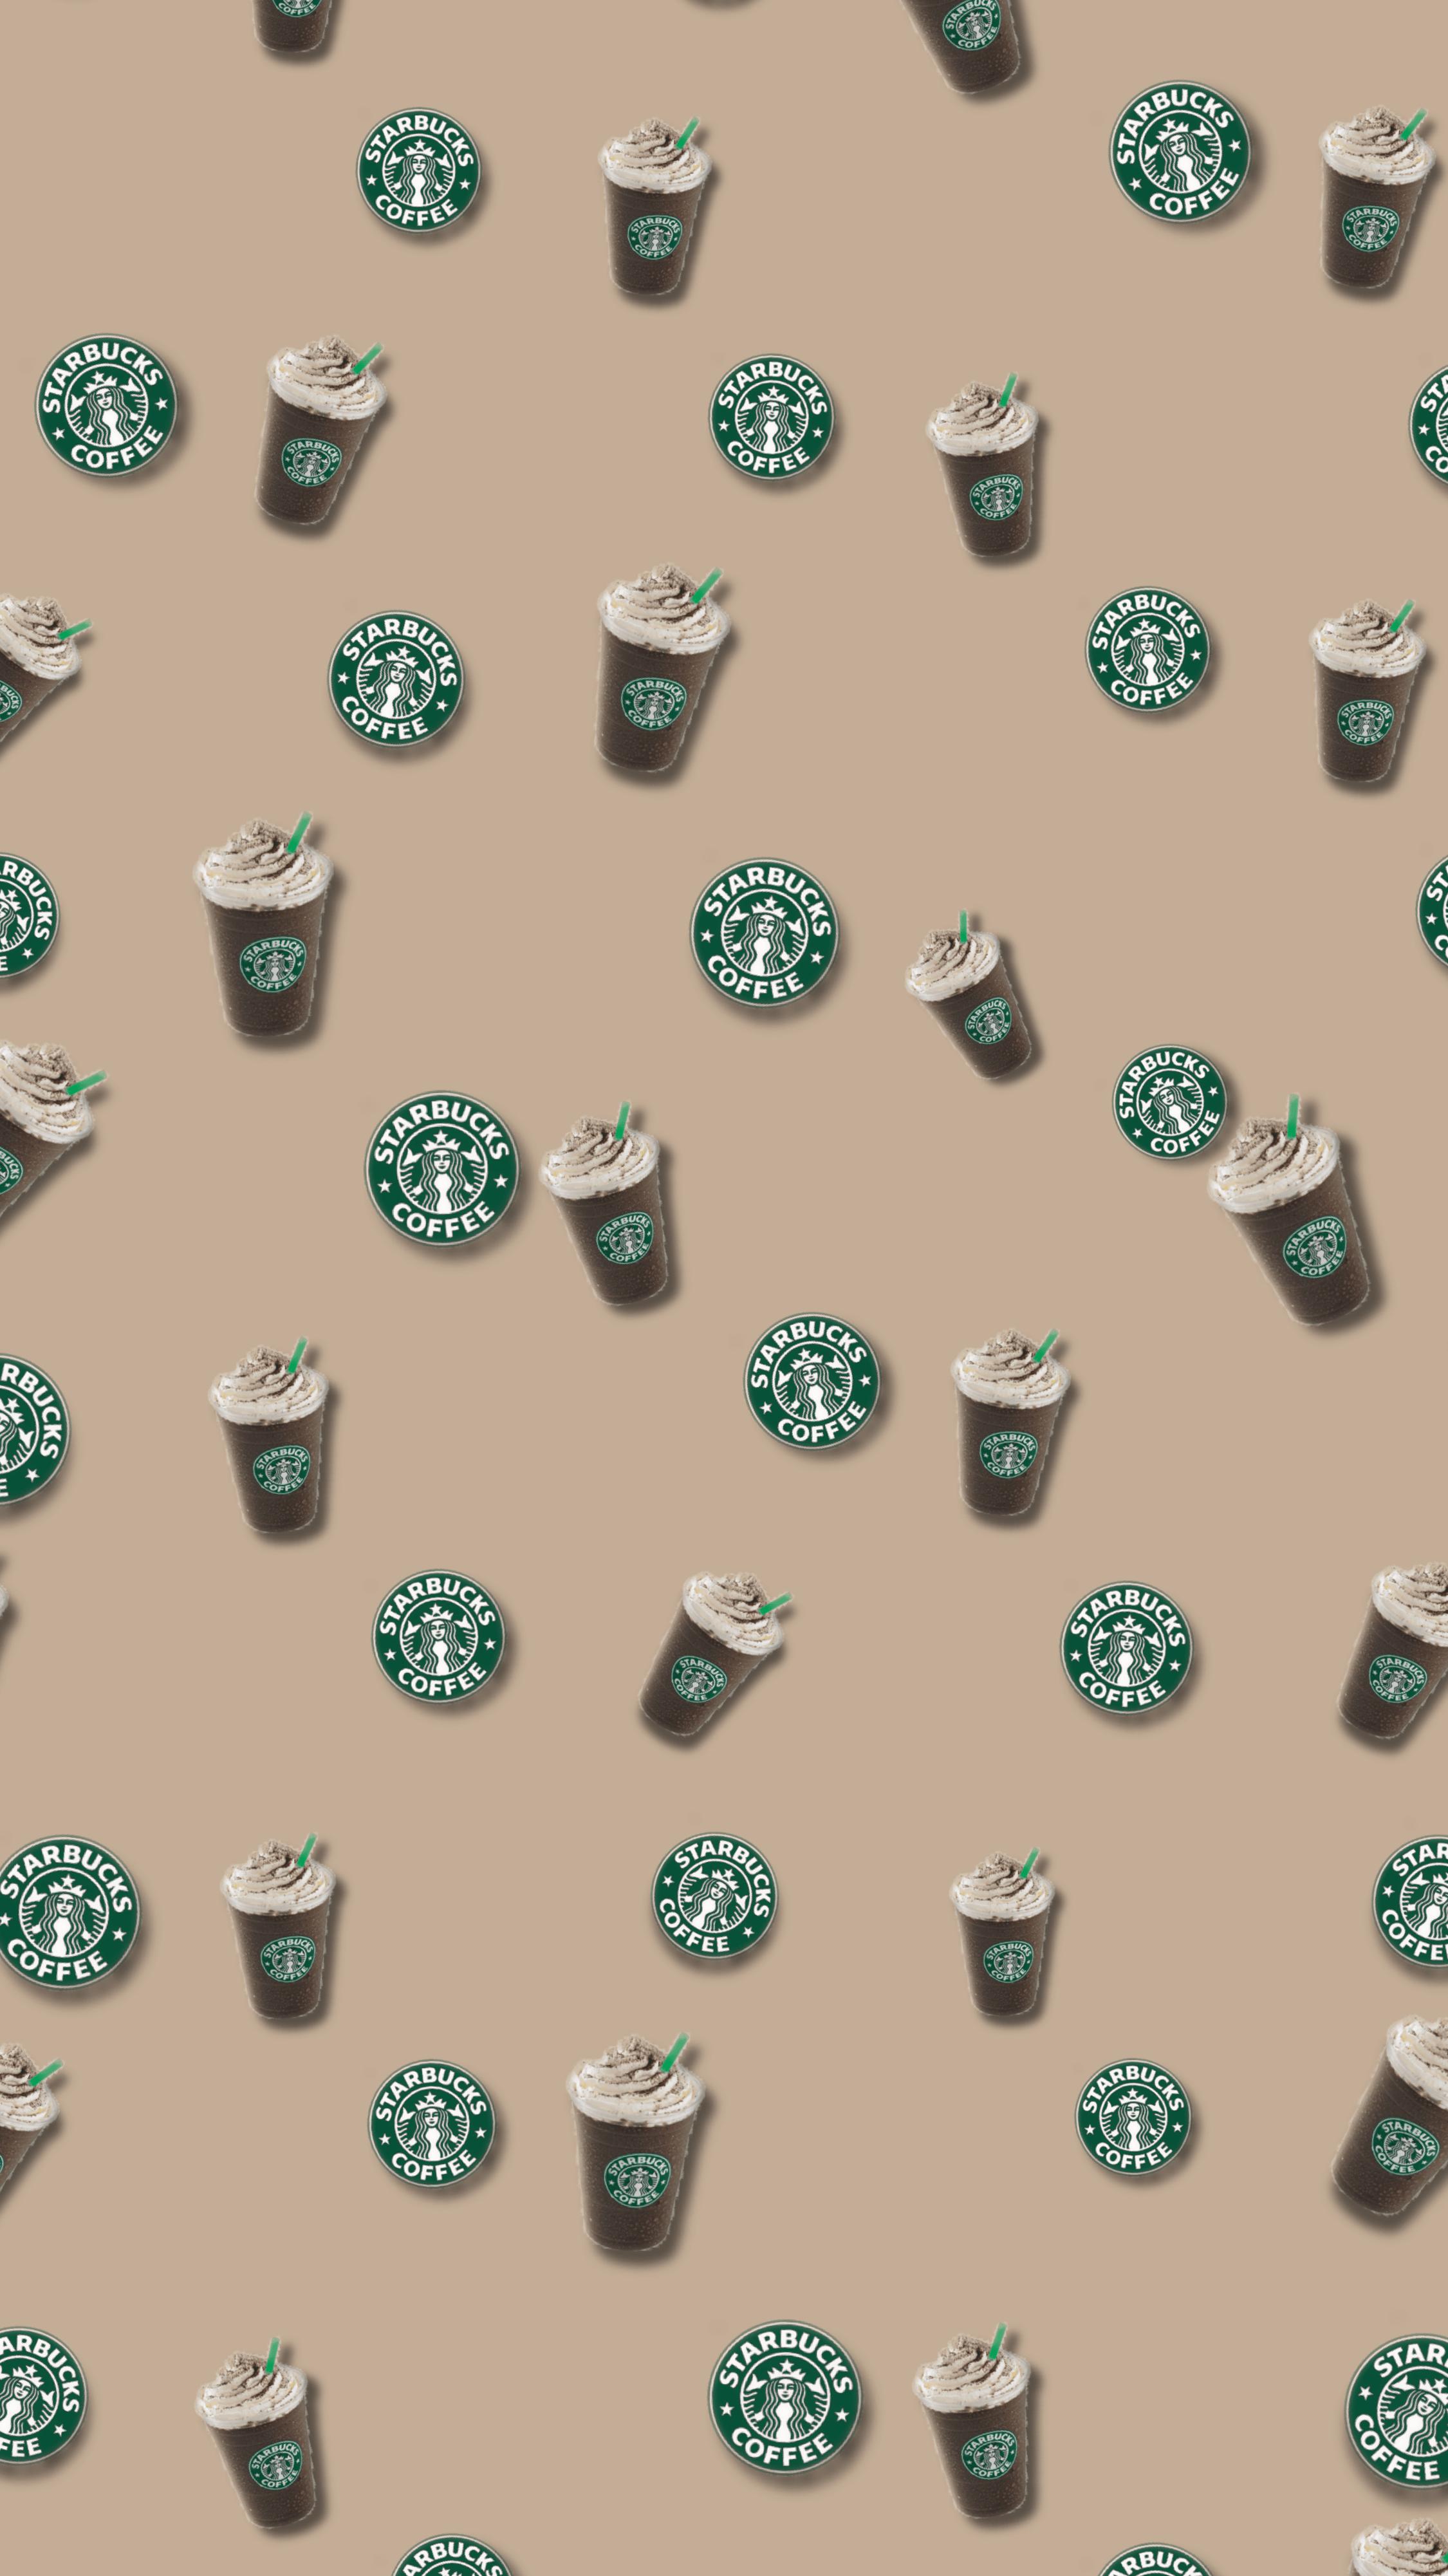 Aesthetic Starbucks Wallpapers - Wallpaper Cave